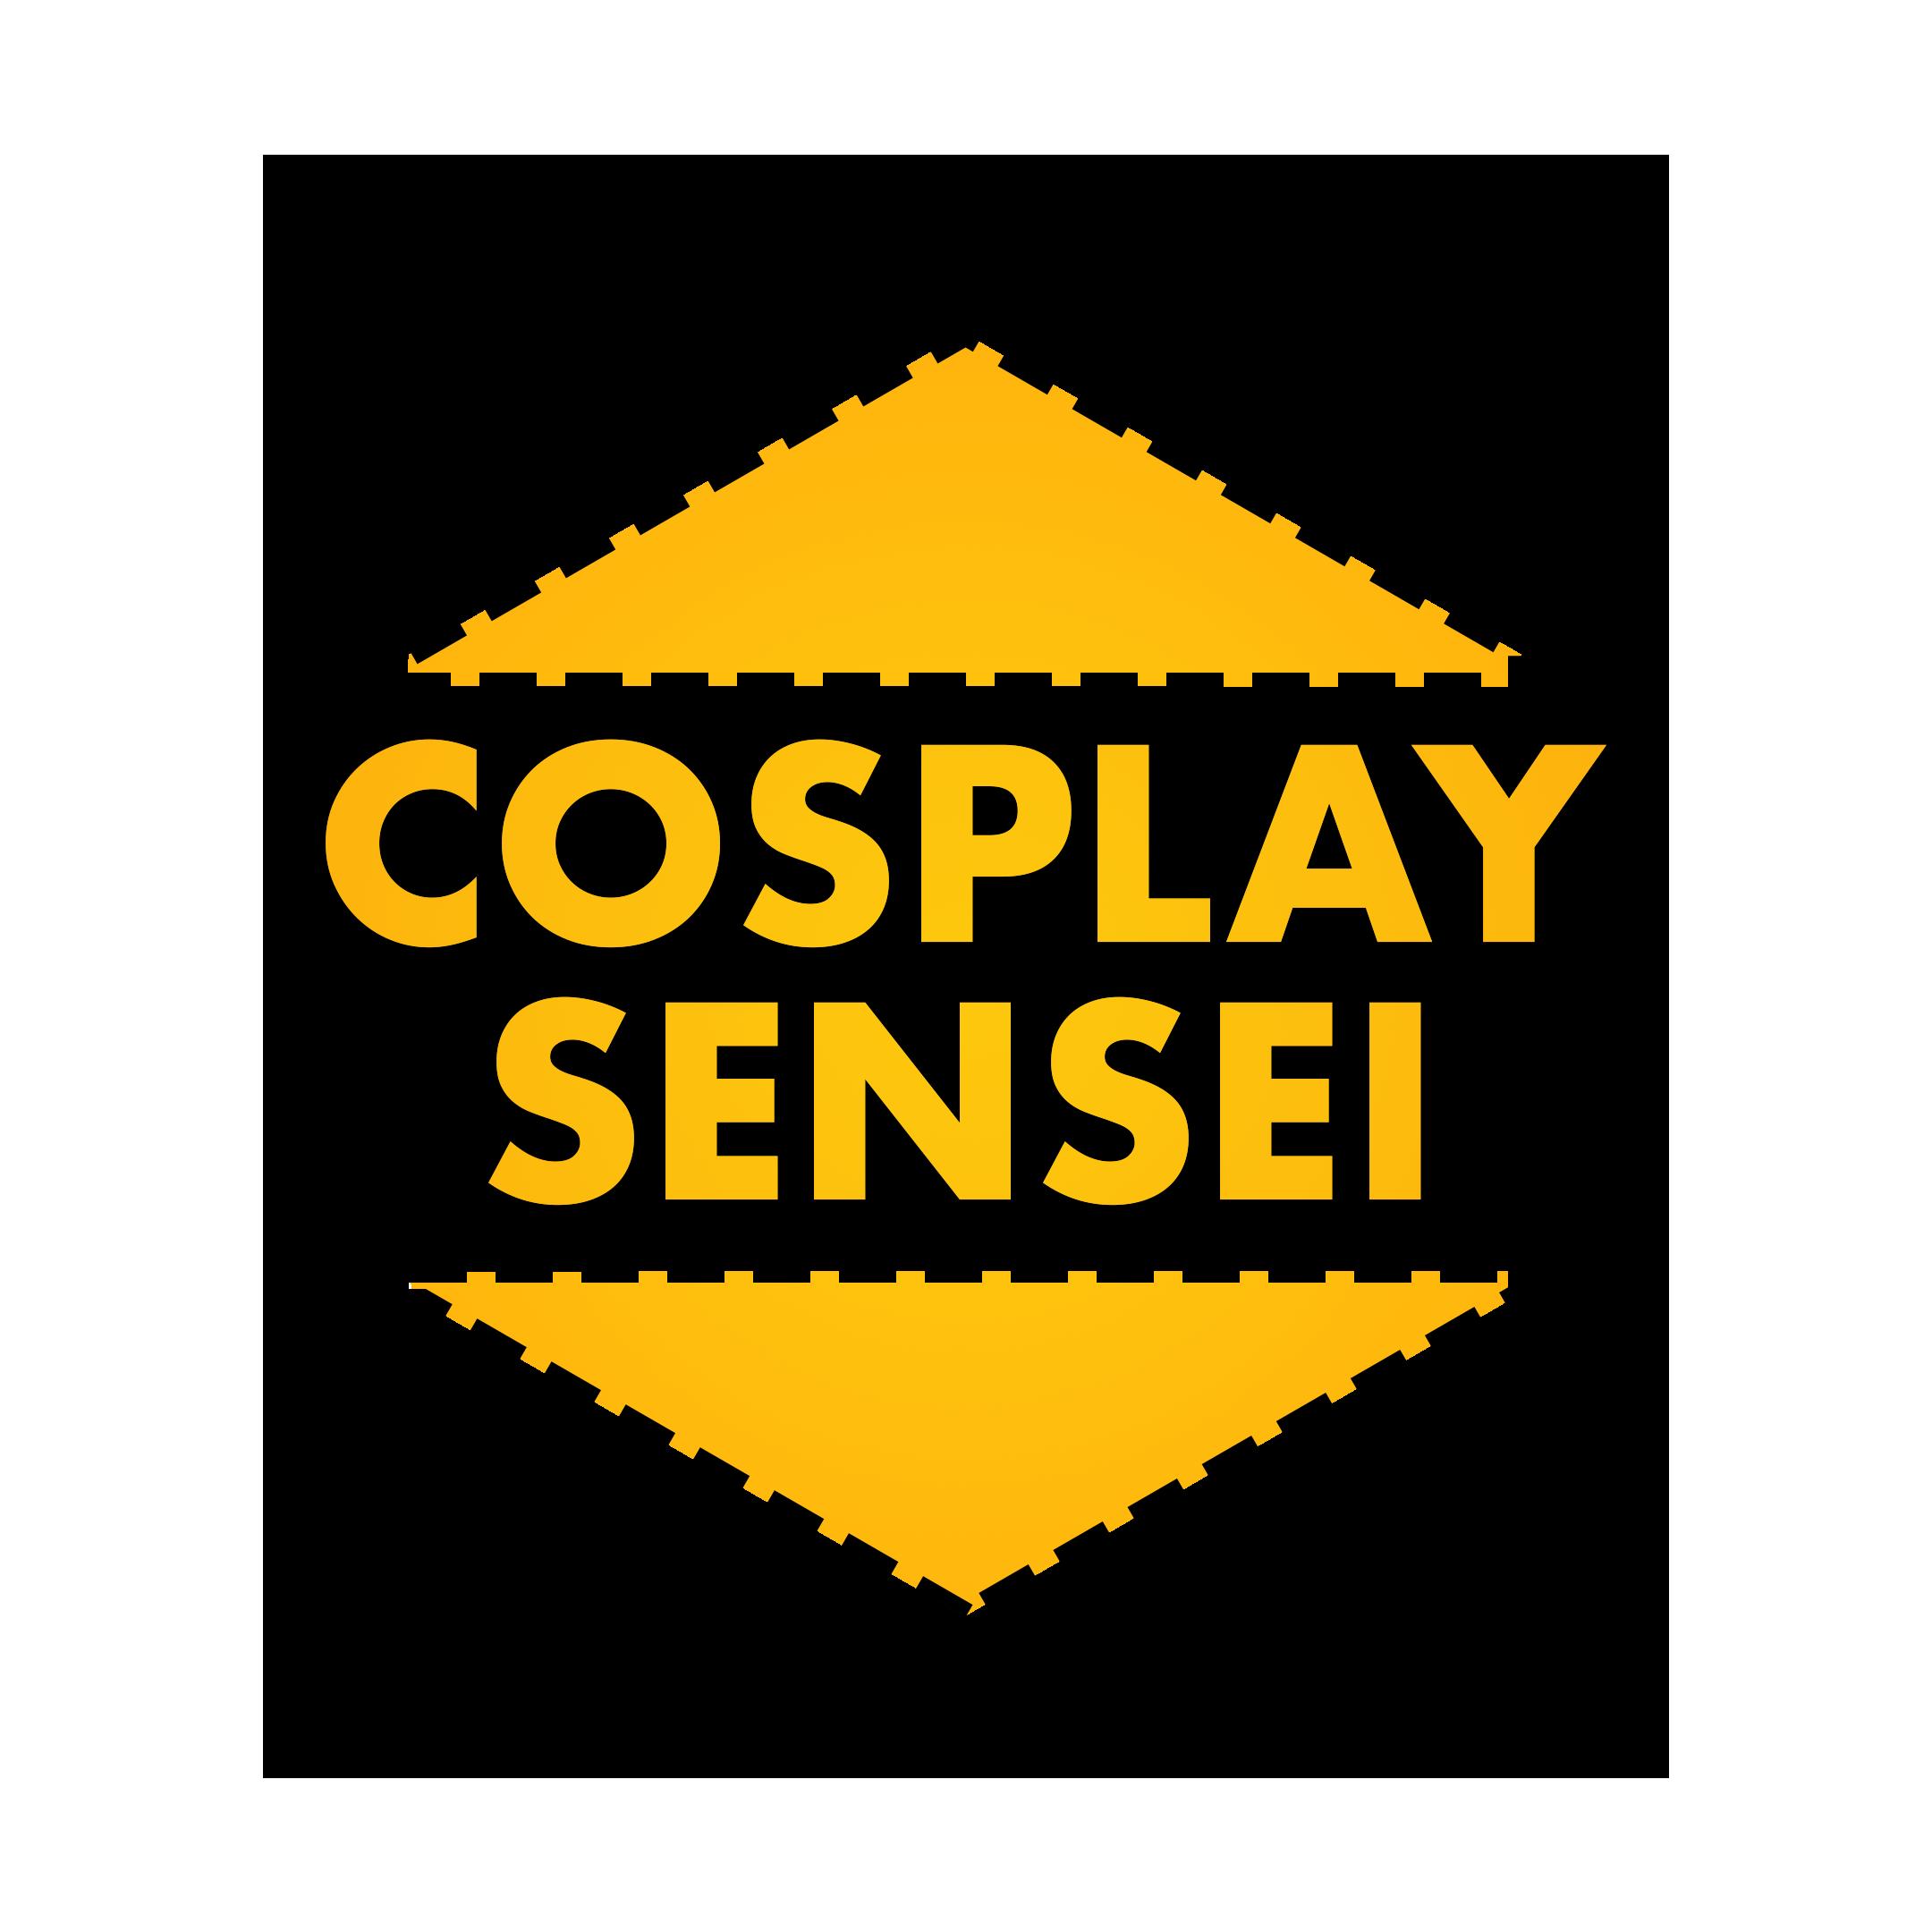 CosplaySenseiLogo.png